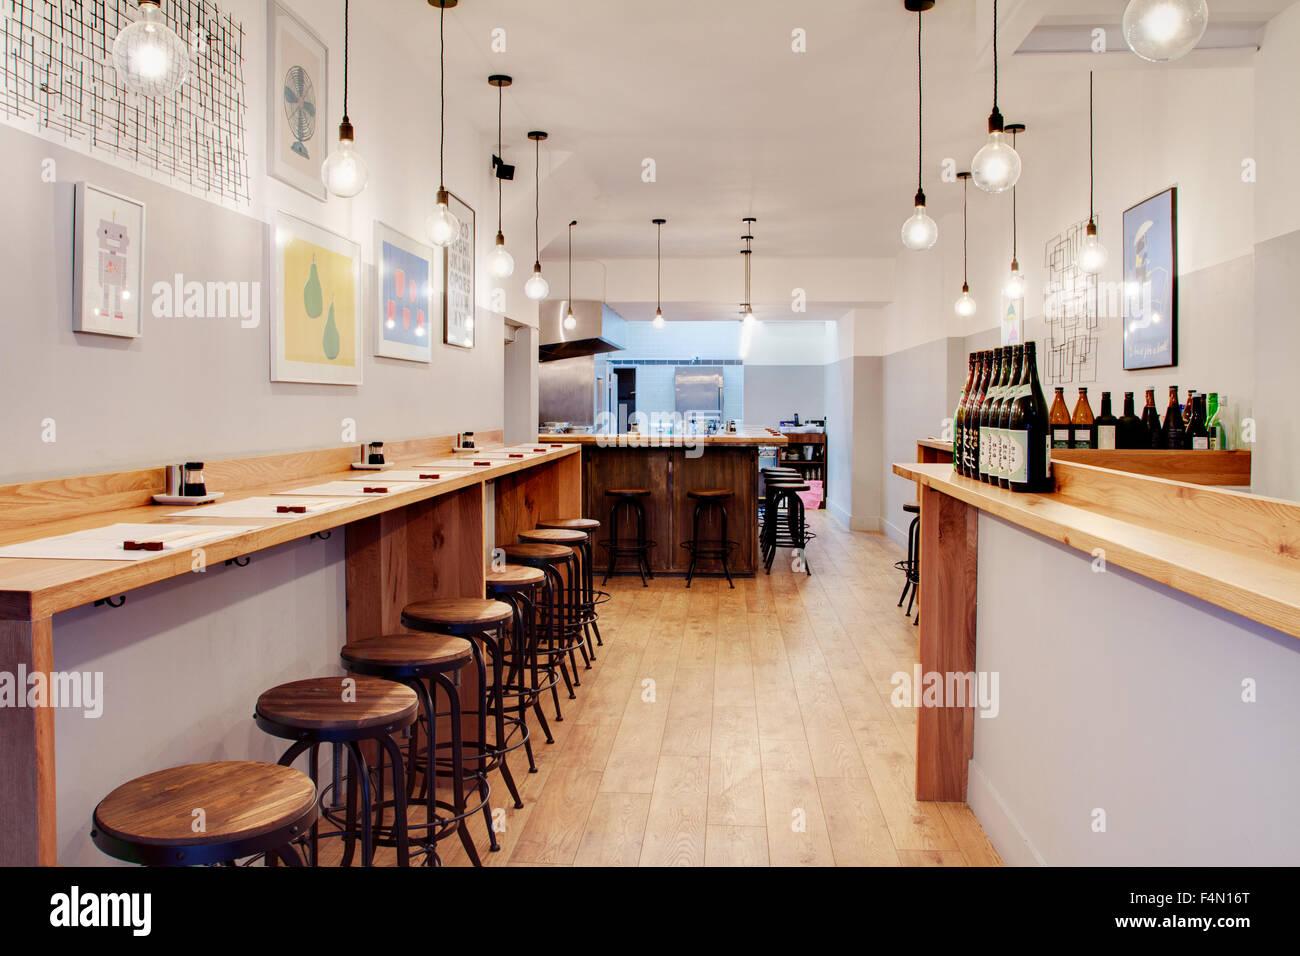 upscale restaurant interior stock photos & upscale restaurant